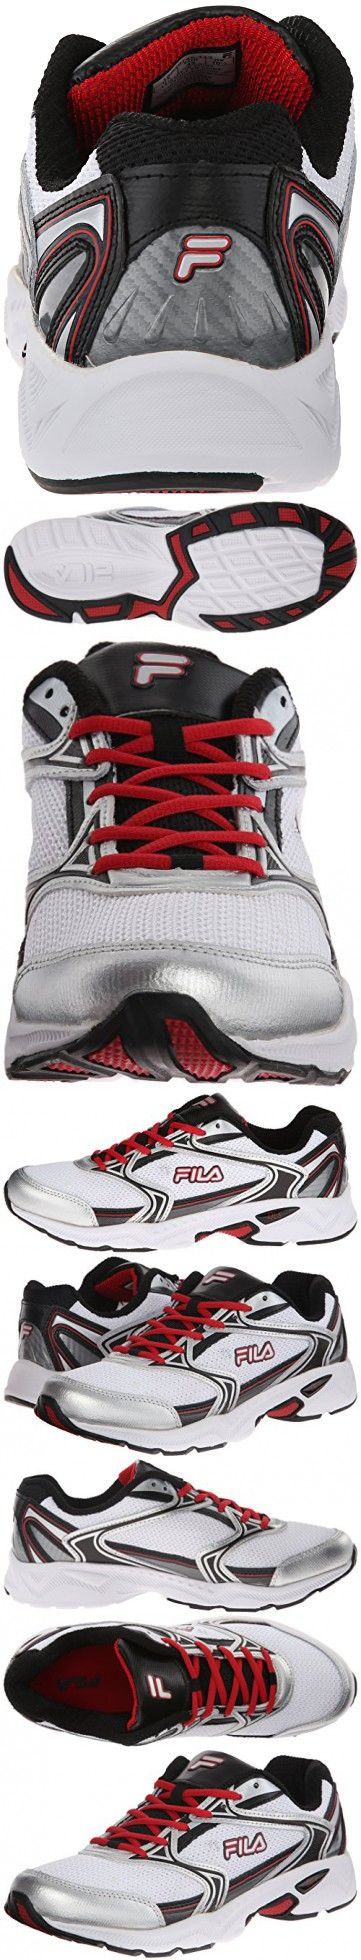 Fila Men's Xtent 2 Running Shoe, WhiteBlackFila Red, 8.5 M